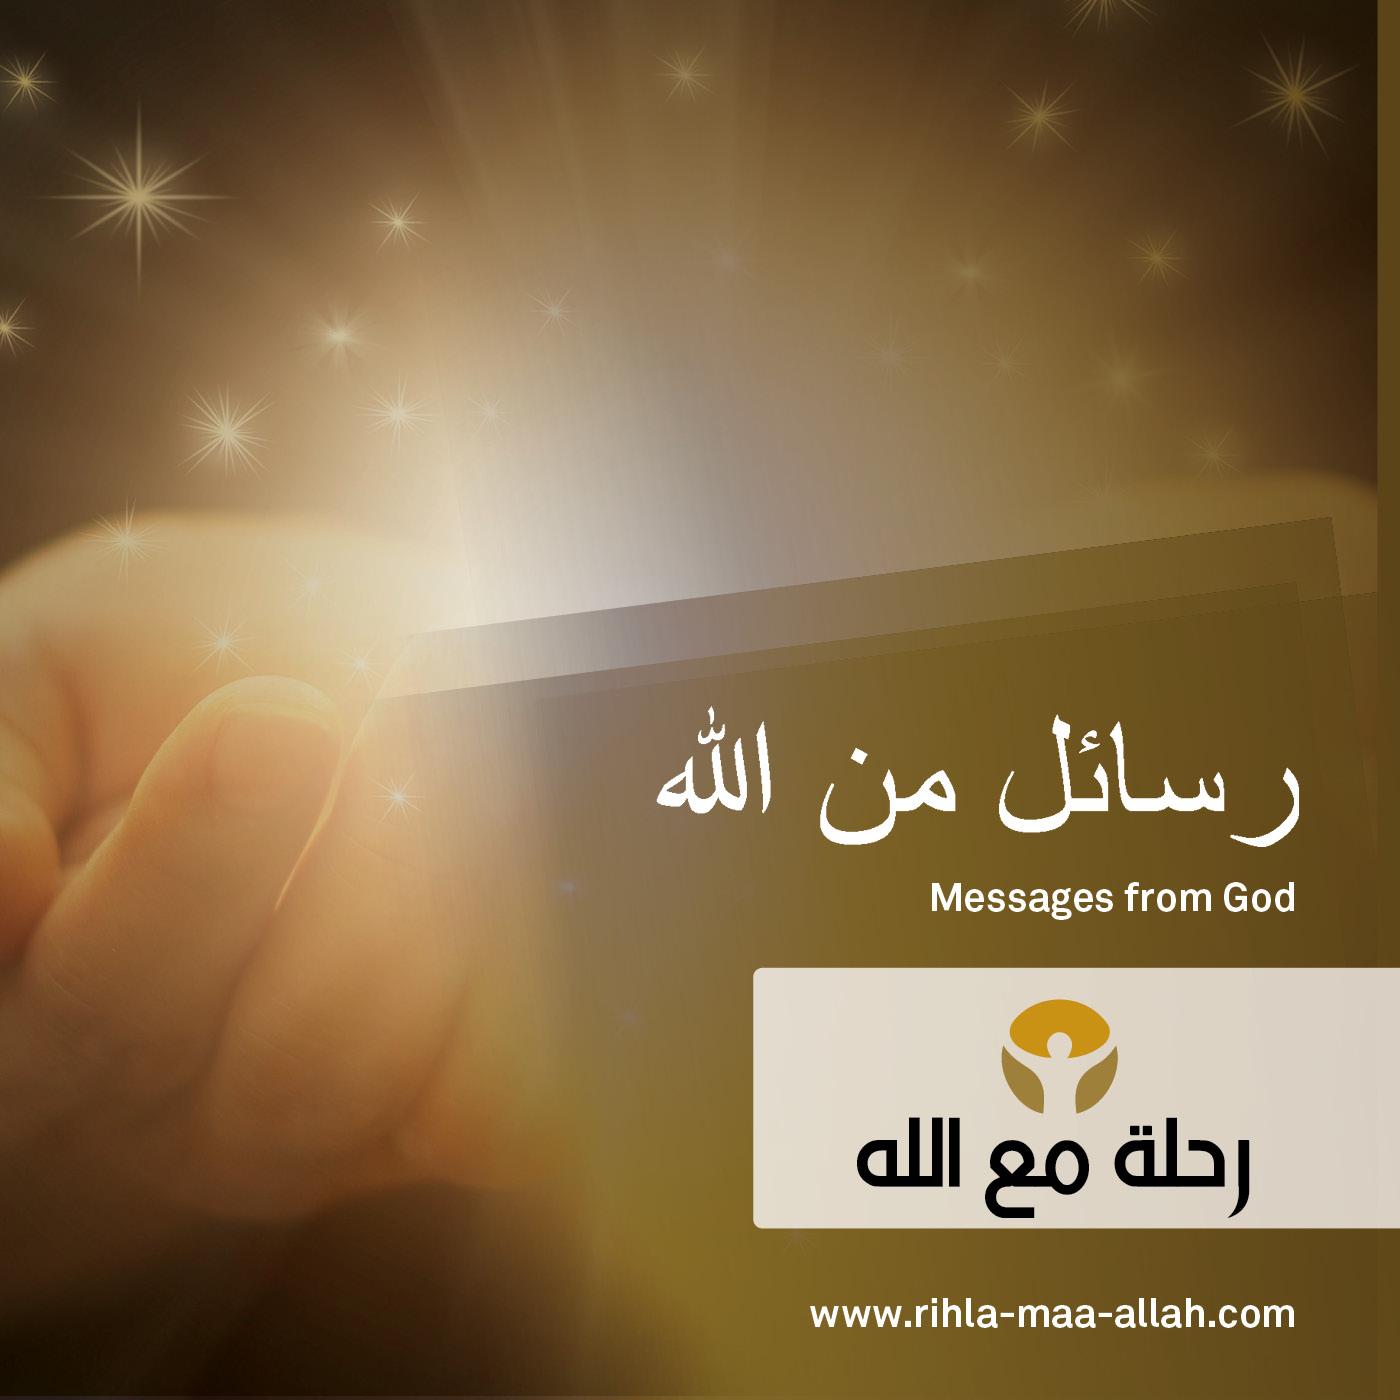 رسائل من الله Cover